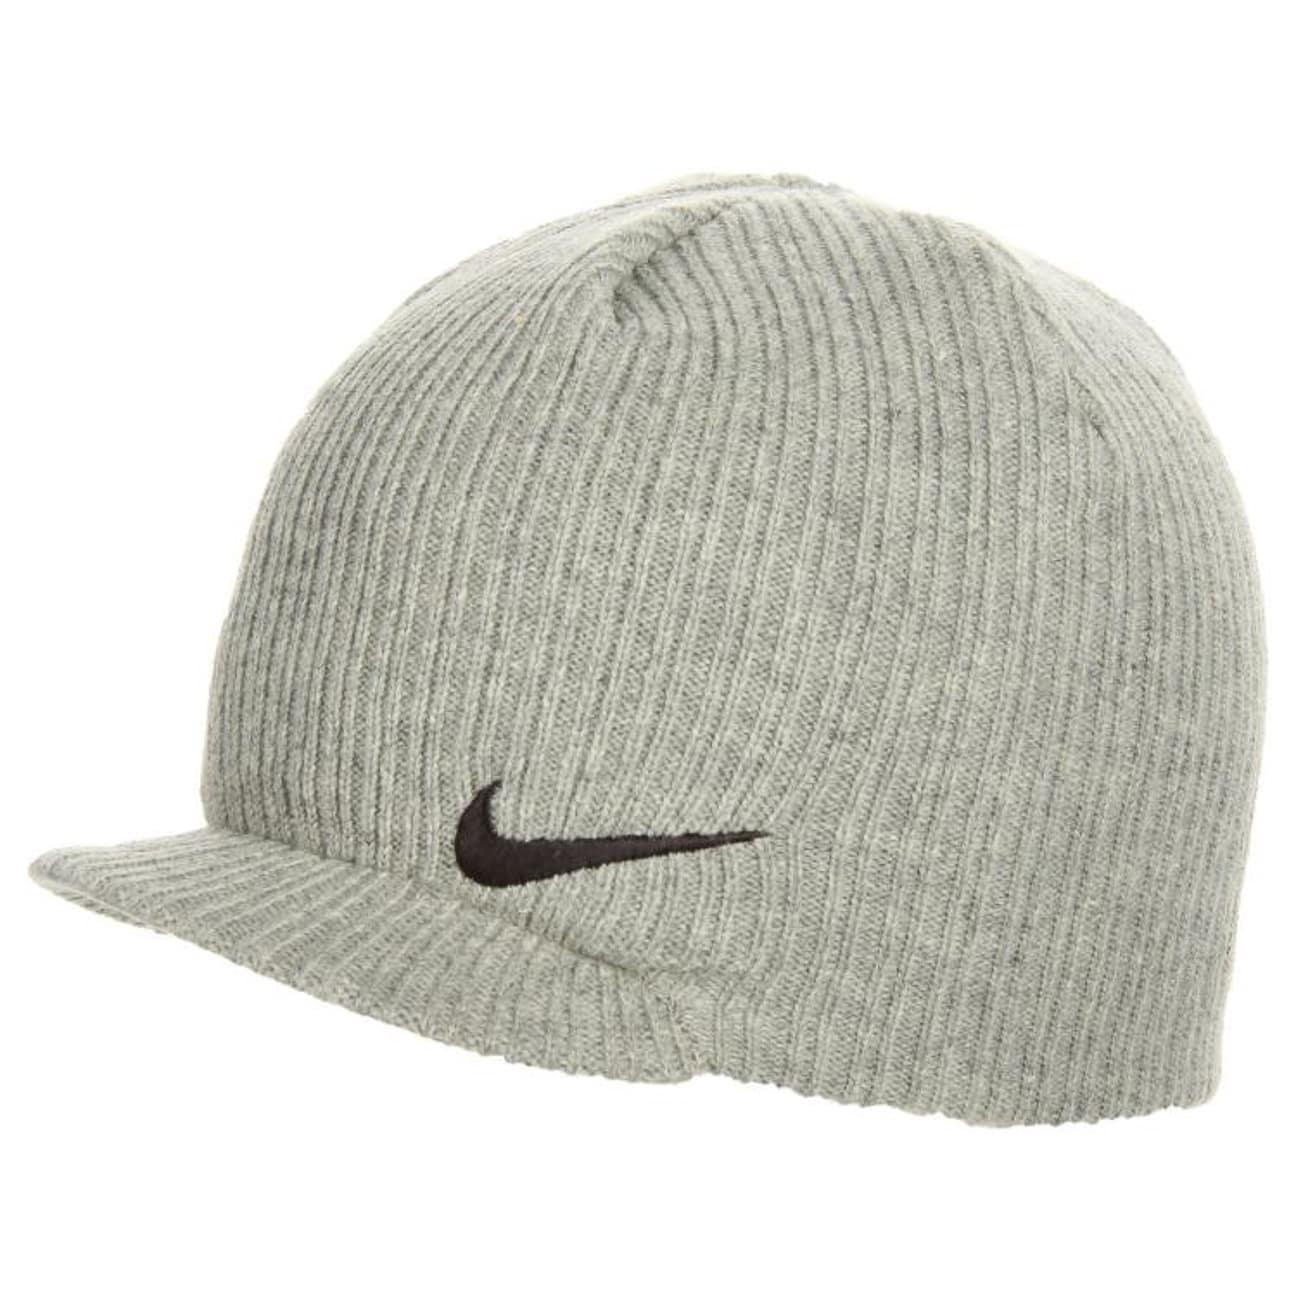 cfd3f9d67d0 QT Swoosh Peaked Beanie by Nike - grey 1 ...